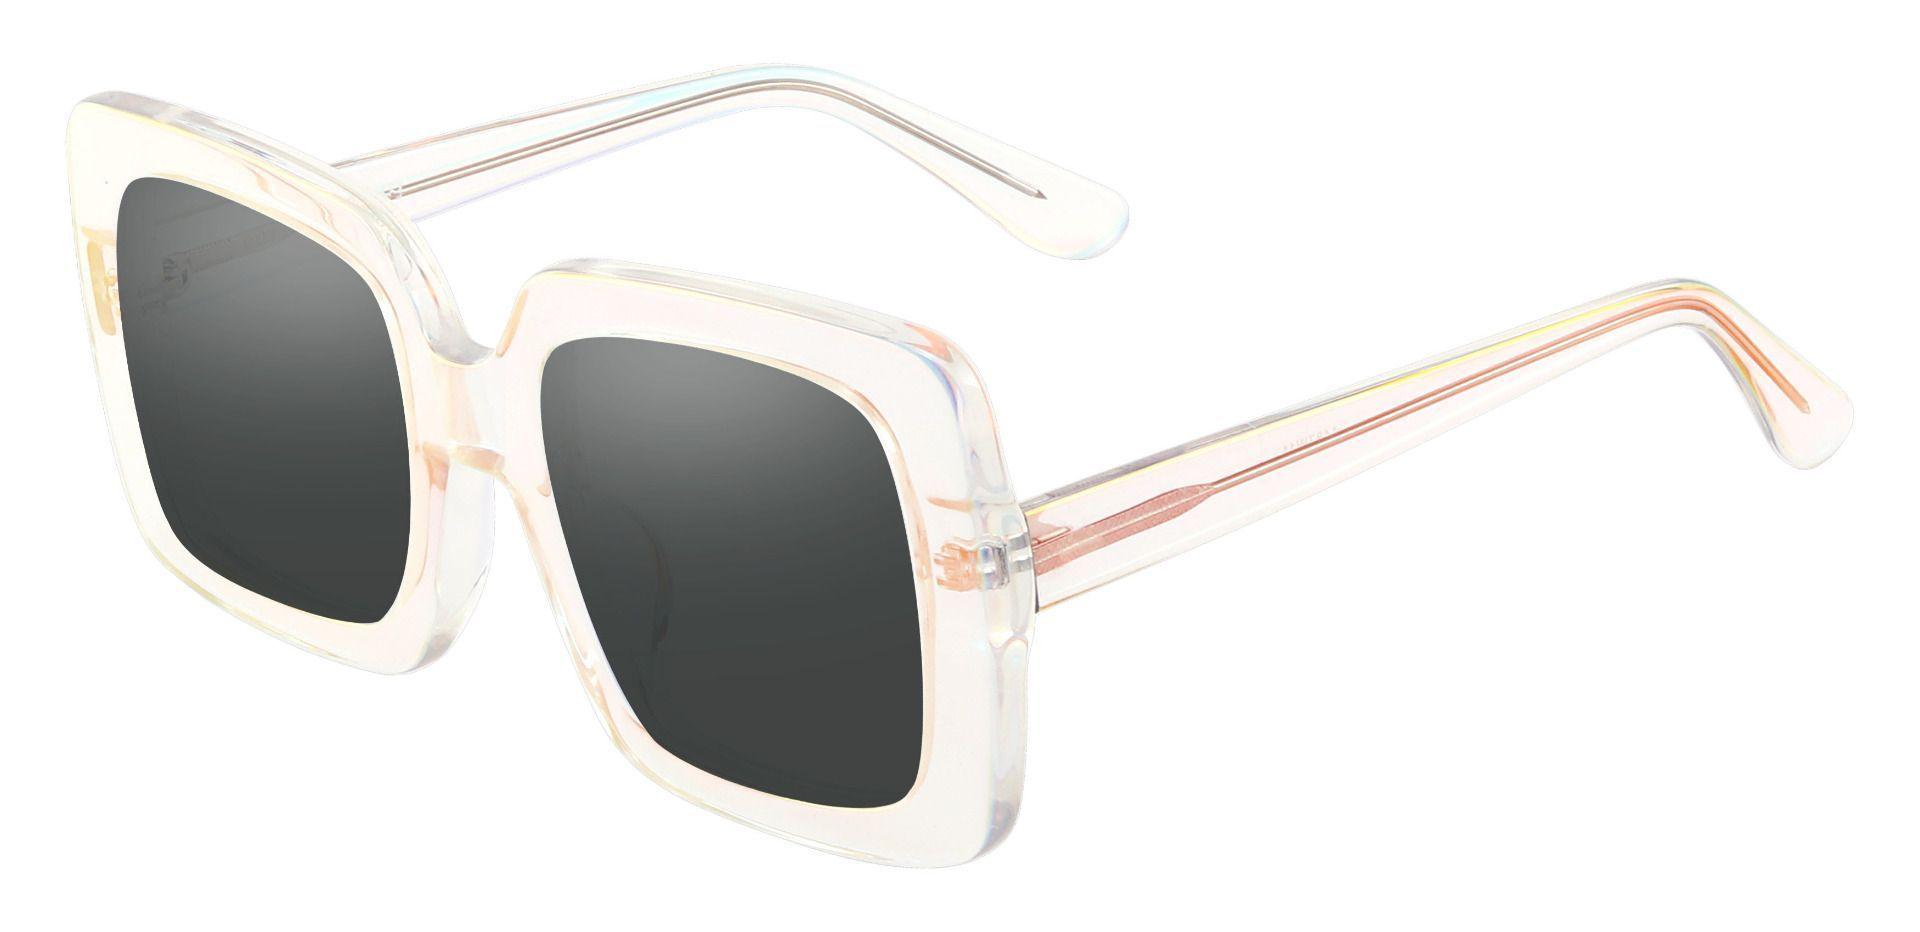 Mimosa Square Prescription Sunglasses - Clear Frame With Gray Lenses